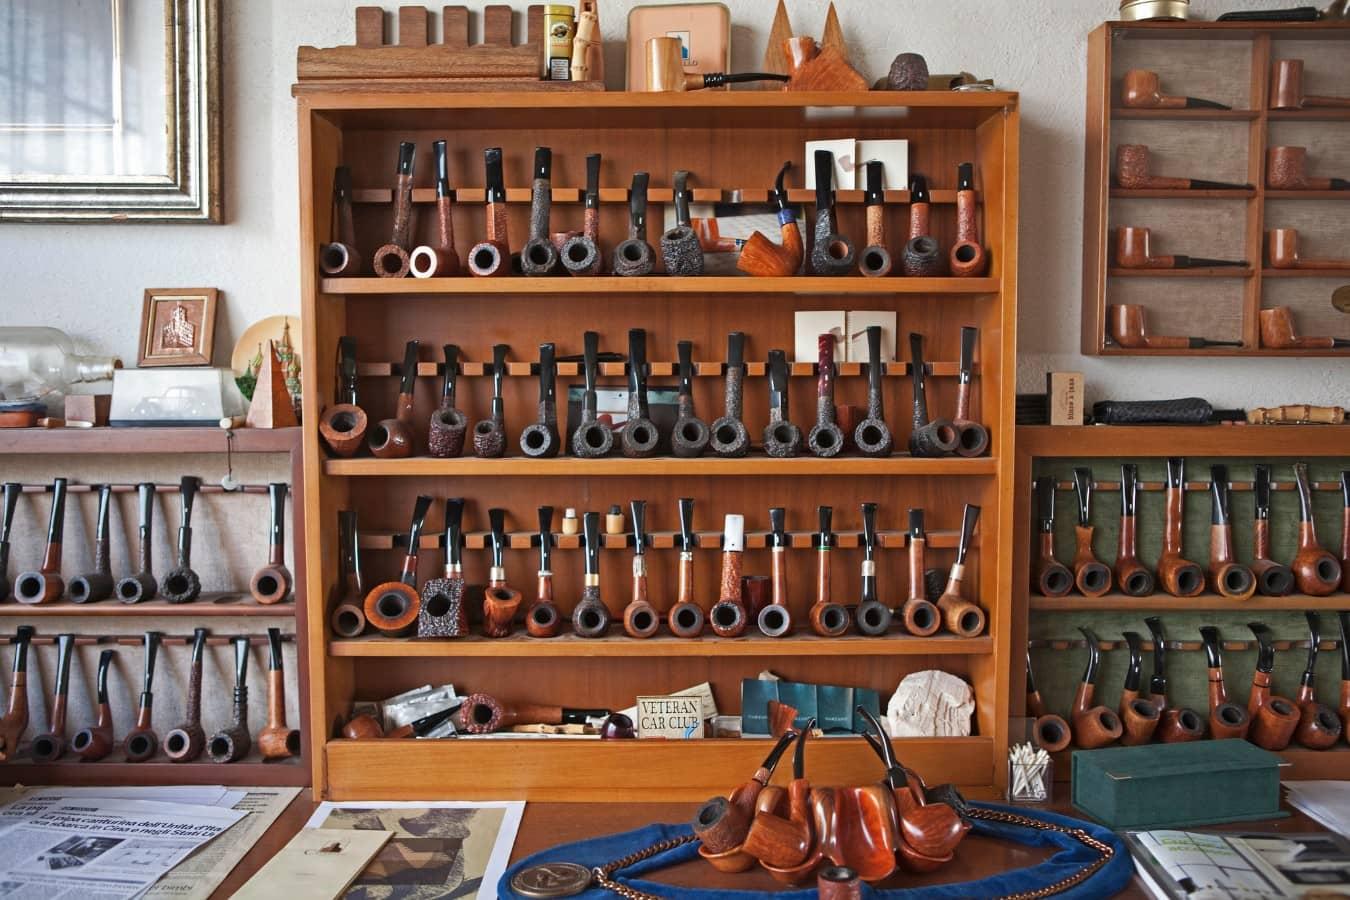 pipa-castello-pipe-makers-cantu-como-thumbnail